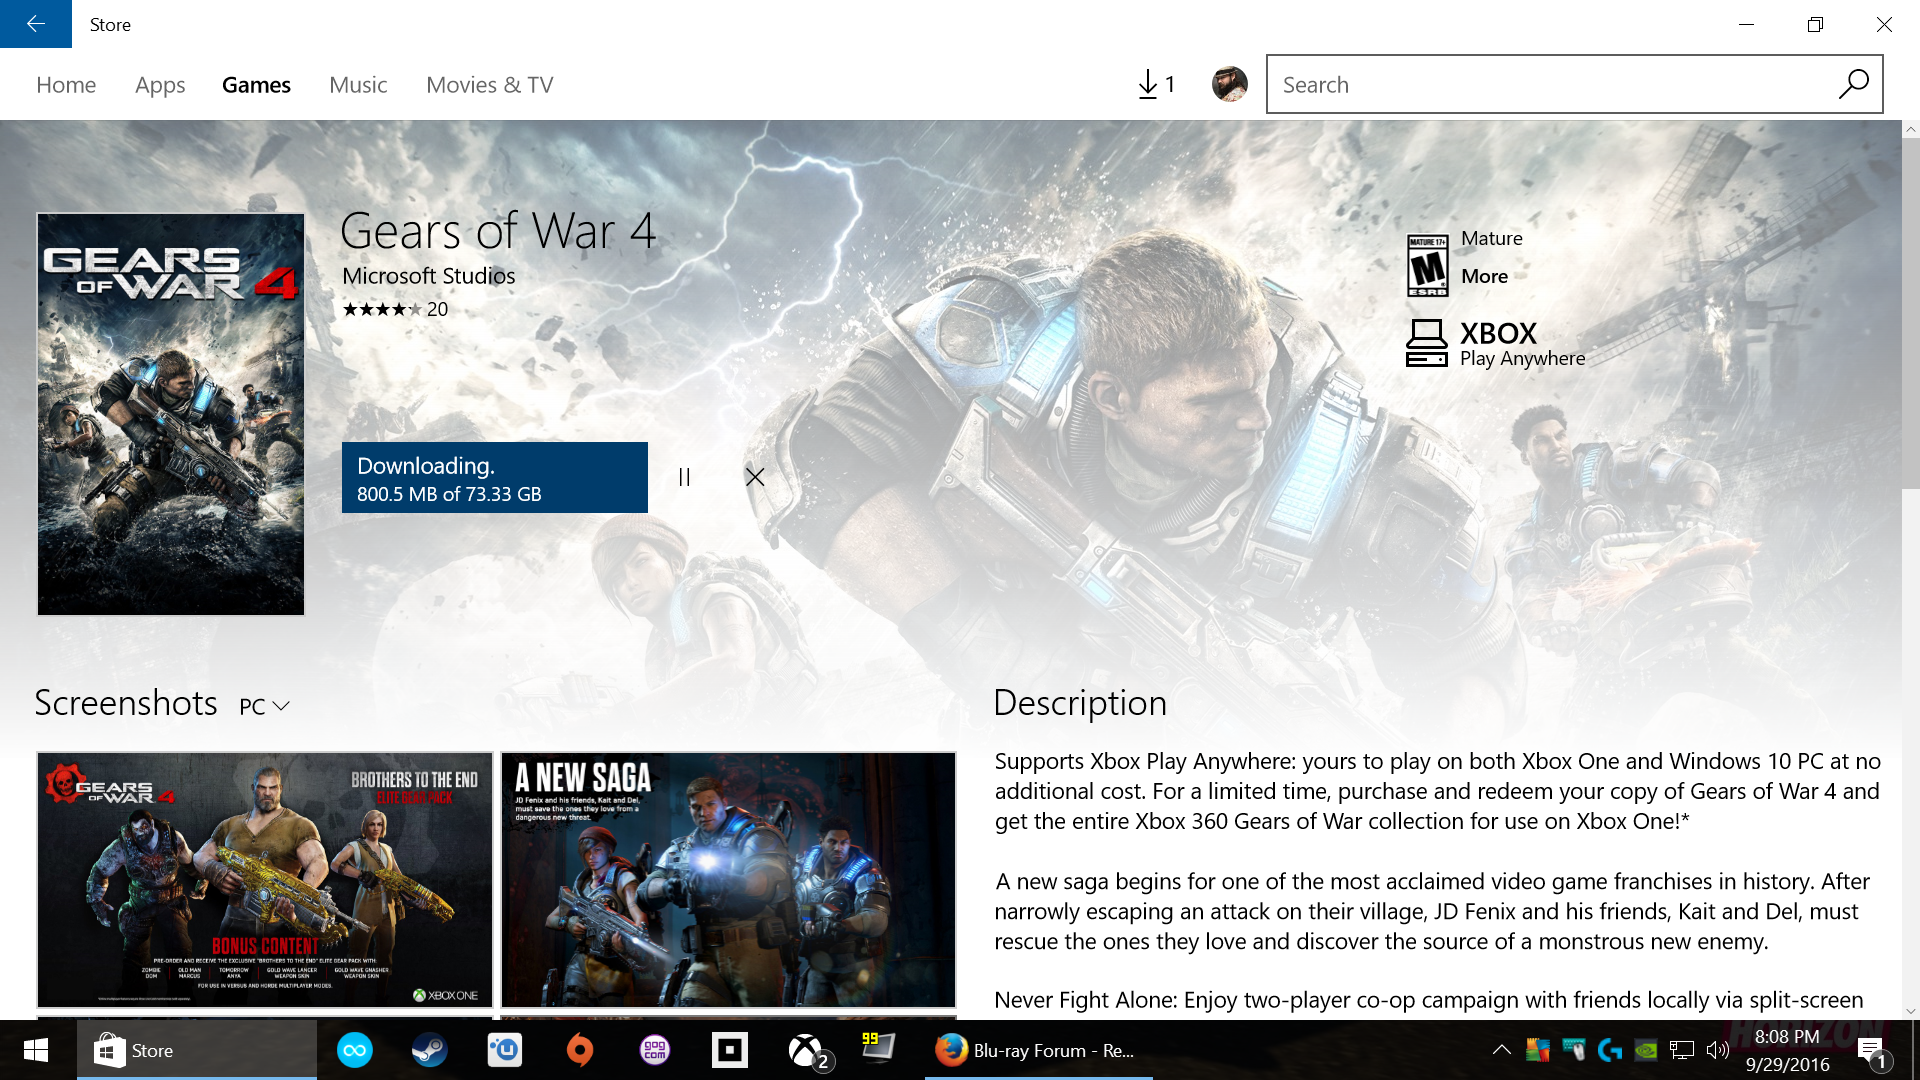 Gears of War 4 Specs - PC Gaming - WeMod Community